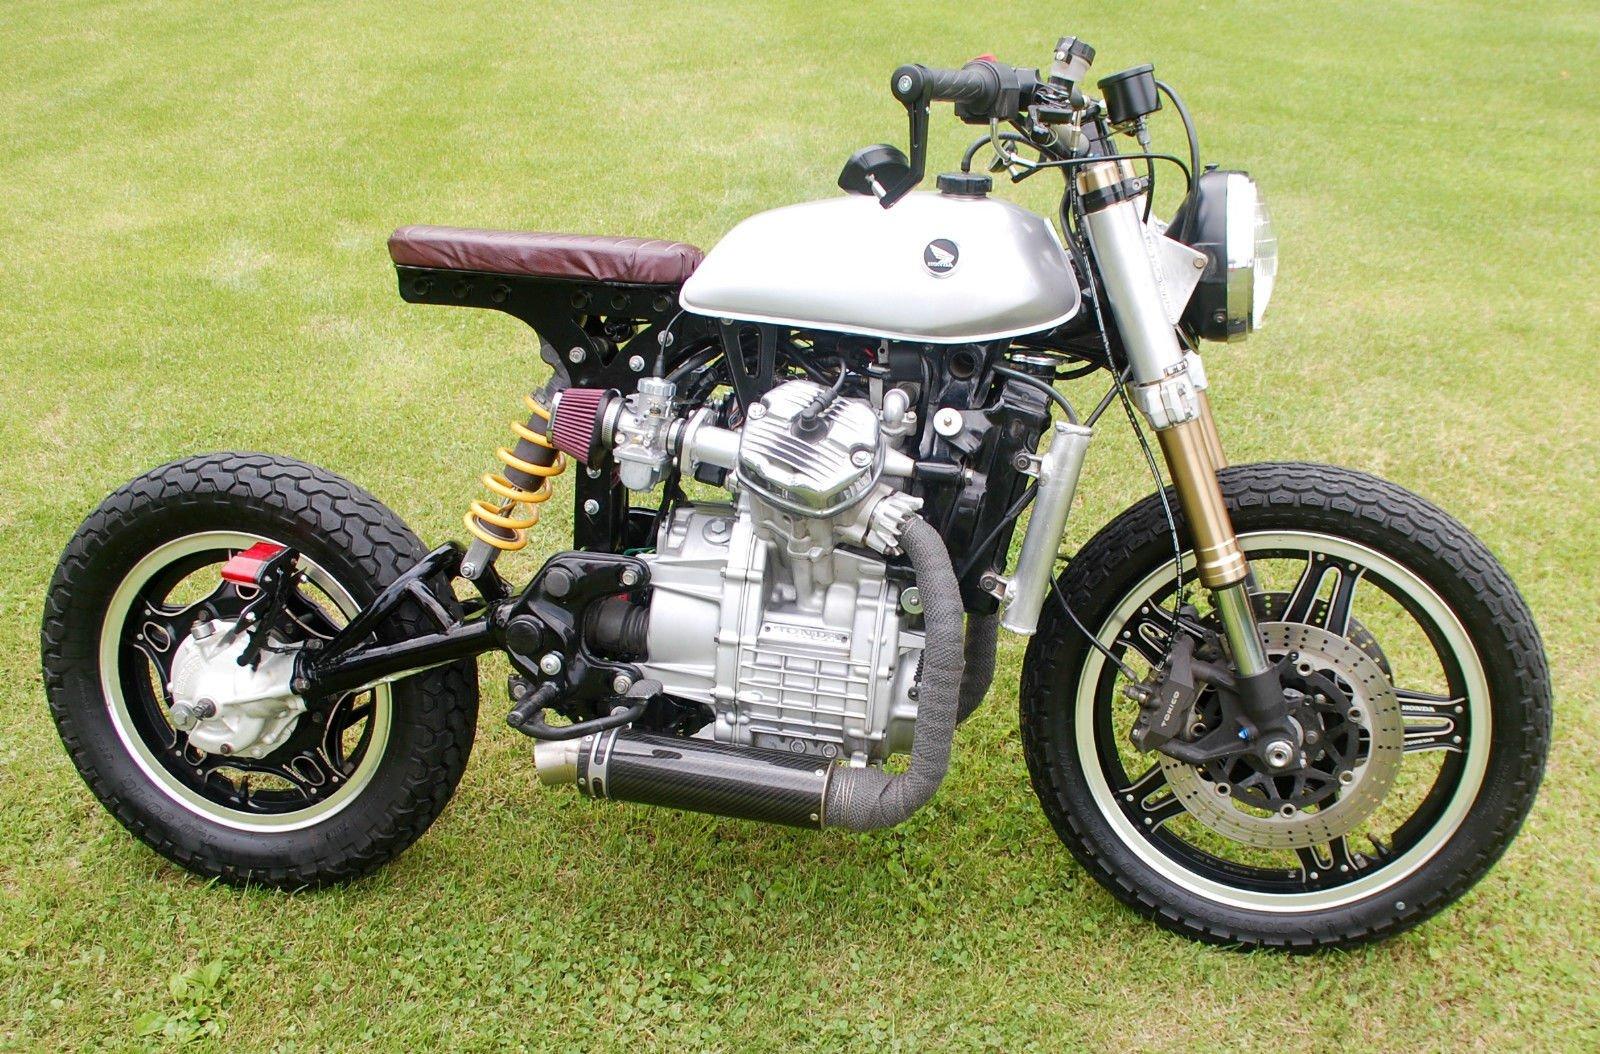 1979 Honda CX500 Twin Mono Bobber Cafe Racer Streefighter motorcycle custom motorbike bike wallpaper | 1600x1054 | 742909 | WallpaperUP